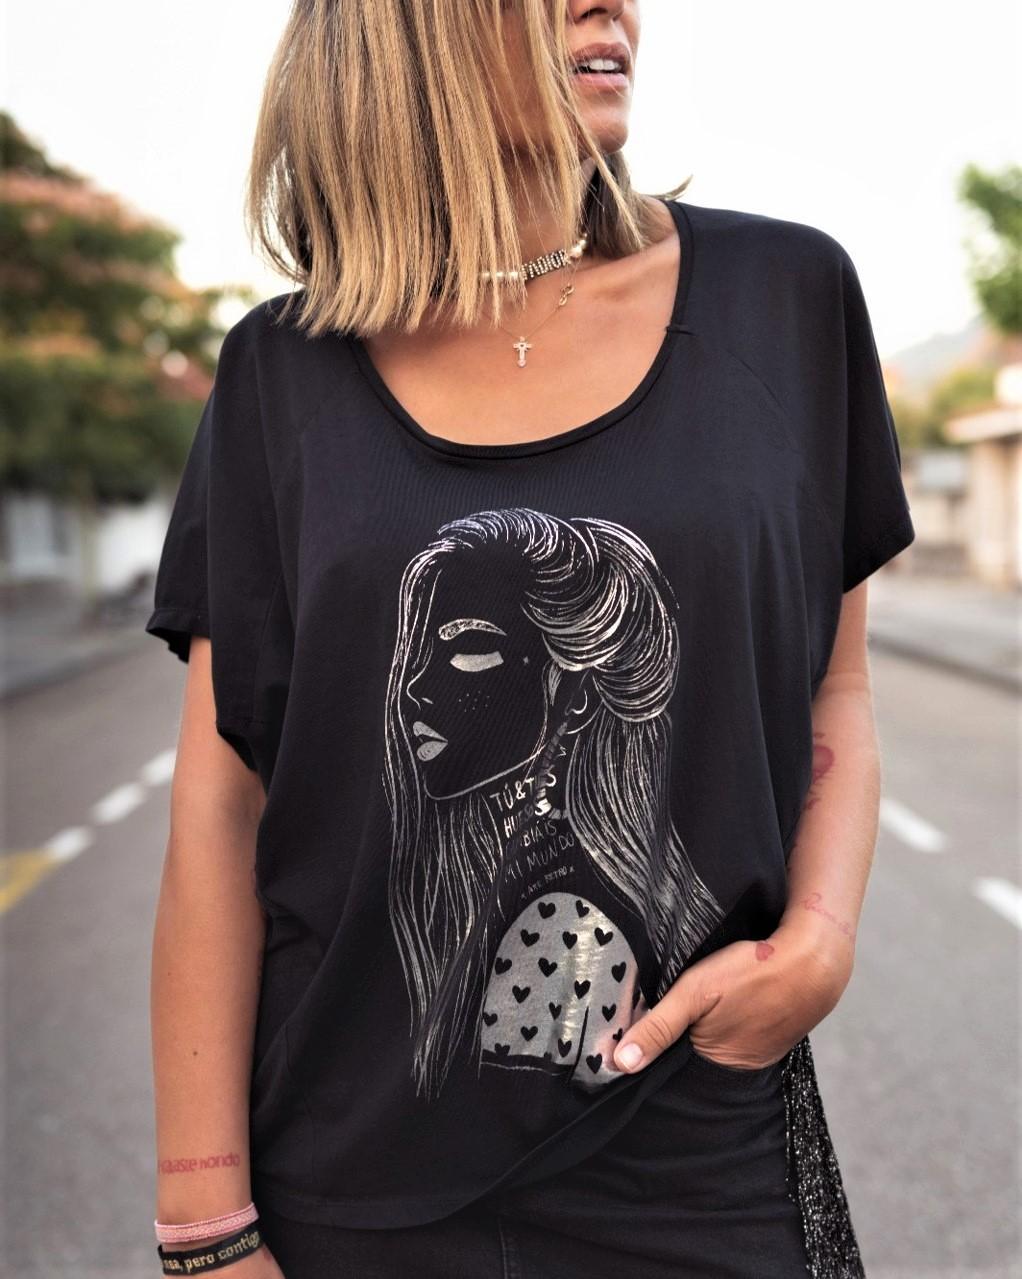 Camiseta tipo kimono con serigrafía foil, efecto plateado brillo.